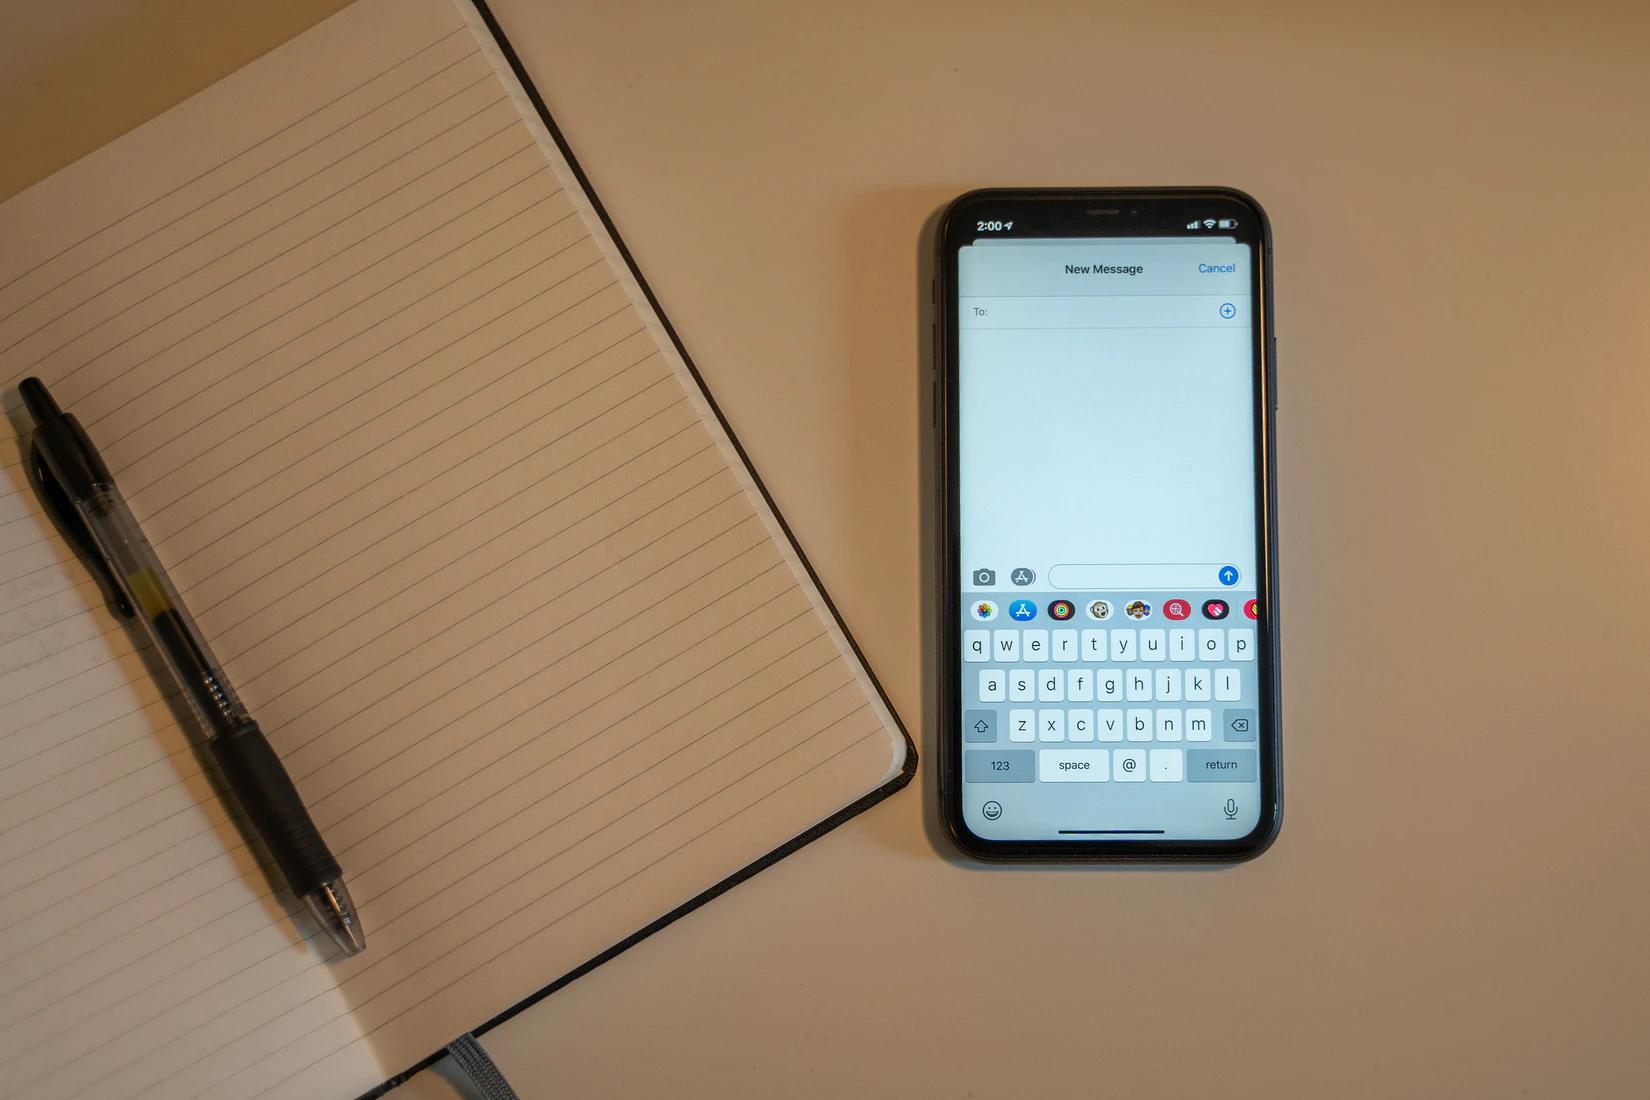 Phone and notebook - Oscar Mucyo Unsplash